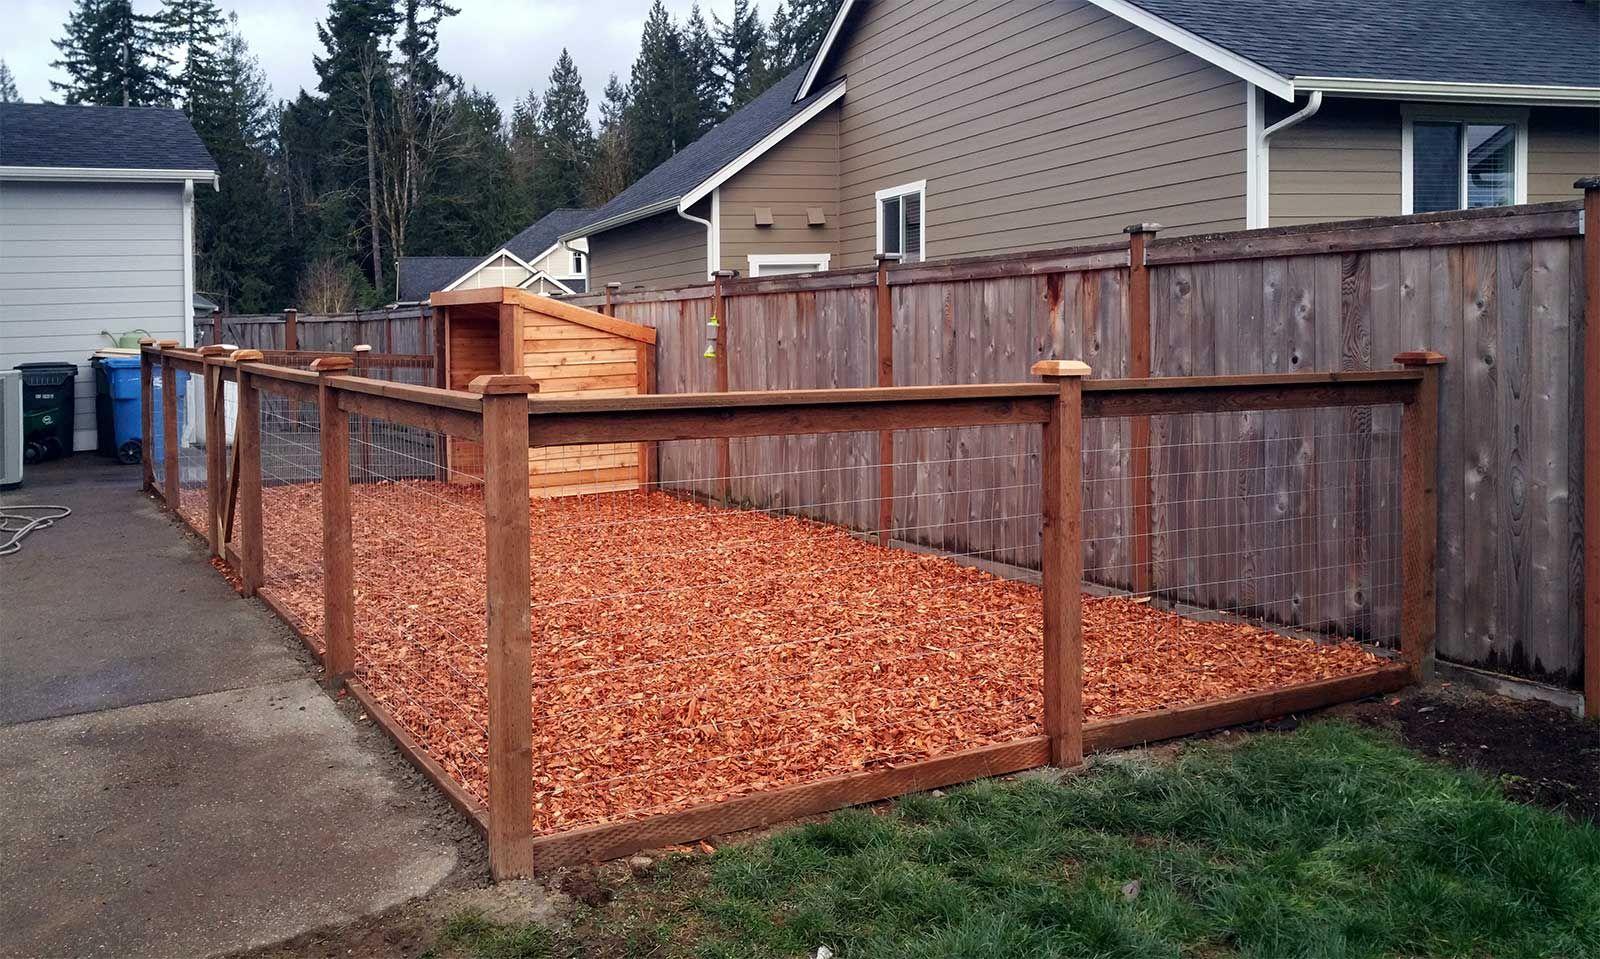 Best 25 cedar chips ideas on pinterest dog kennel for Cedar shavings for dog kennels